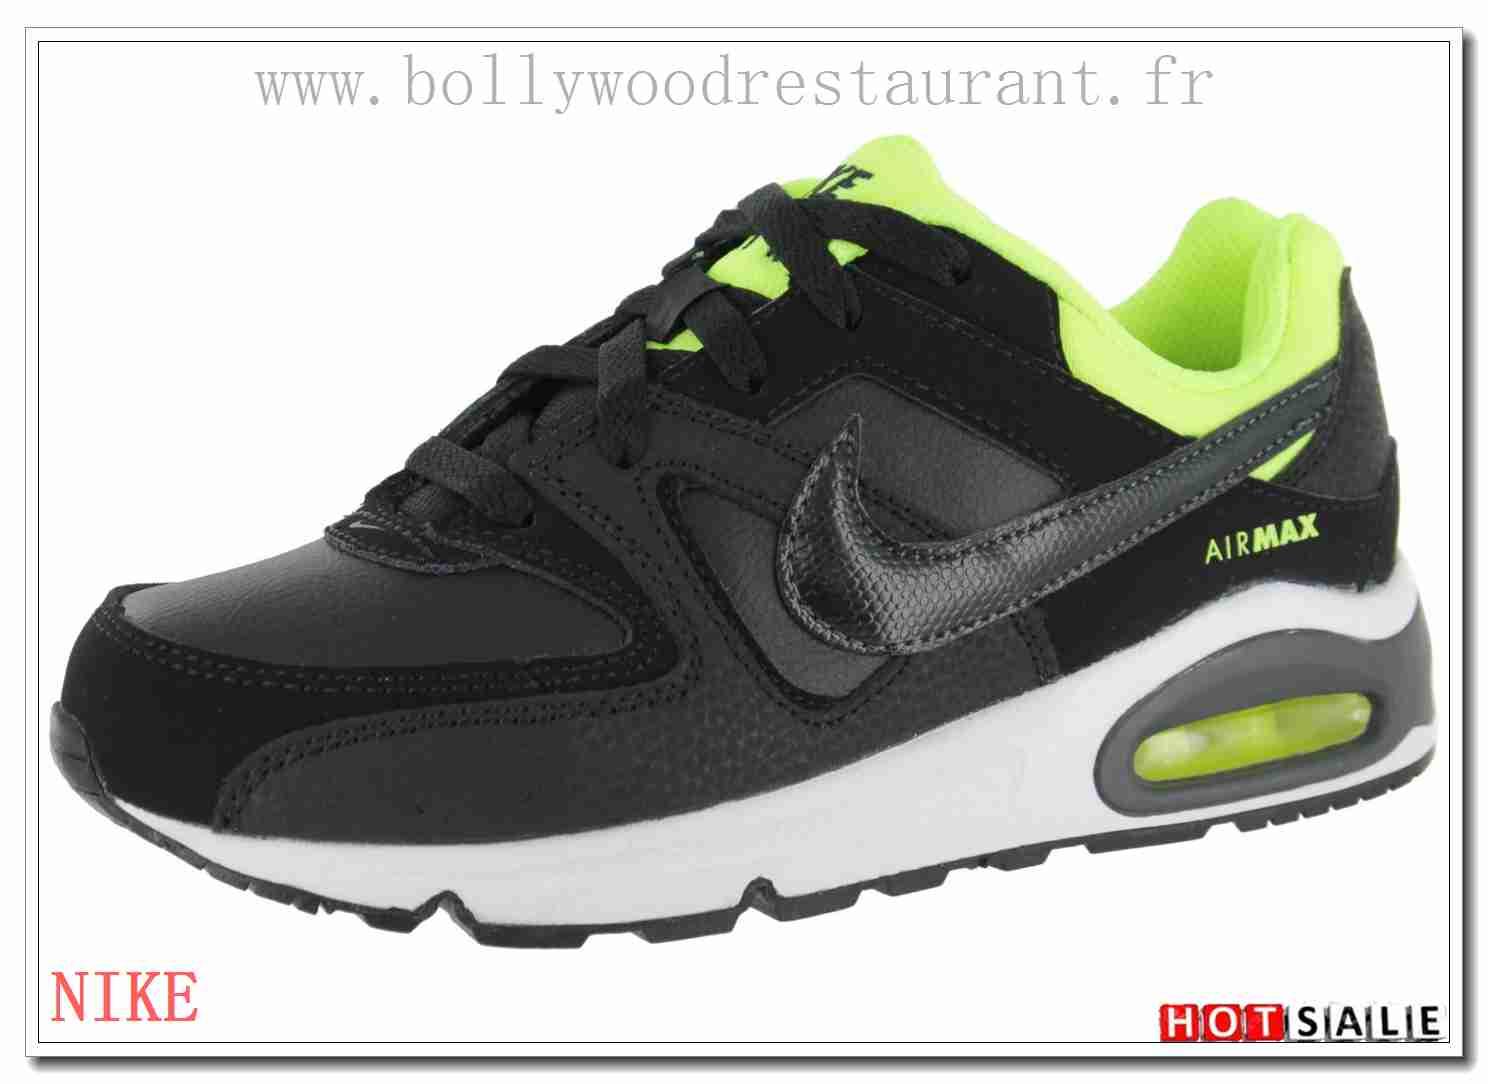 on sale 3d06b 4821a YL6851 Boutique Pas Cher 2018 Nouveau style Nike Air Max Command - Homme  Chaussures - Promotions Vente - H.K.Y. 655 - Taille   40~44